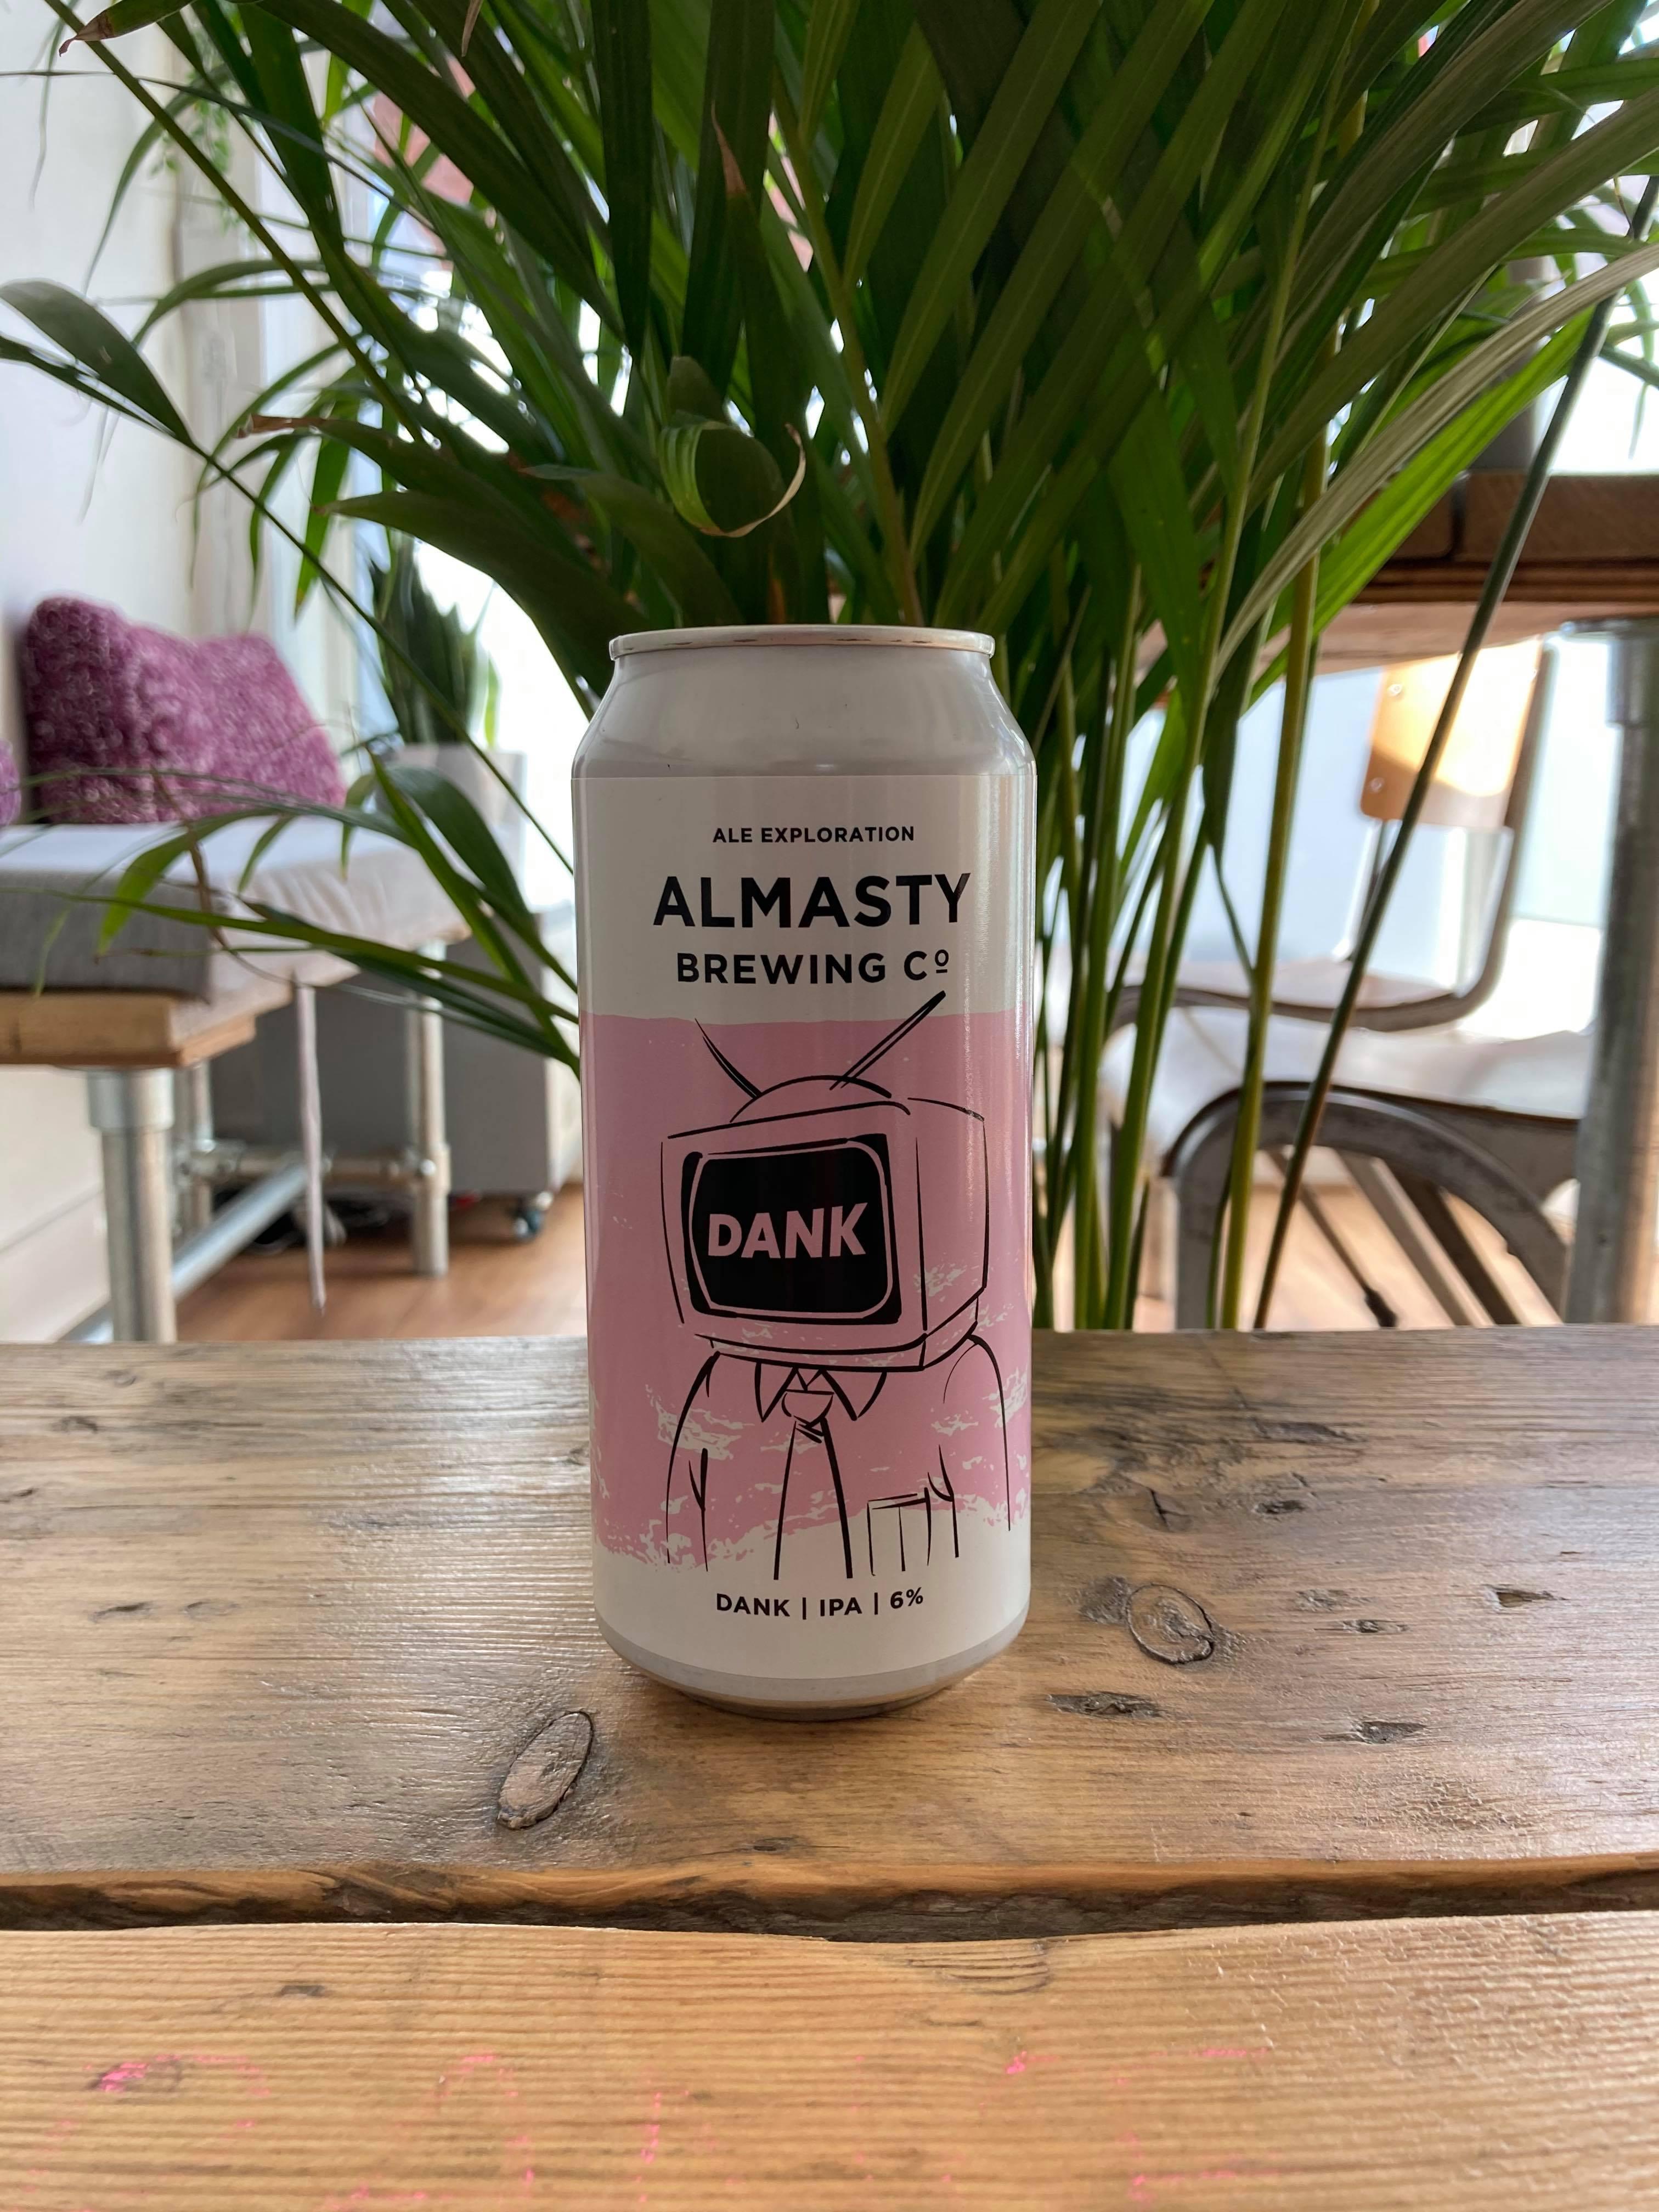 Almasty - Dank IPA 6%